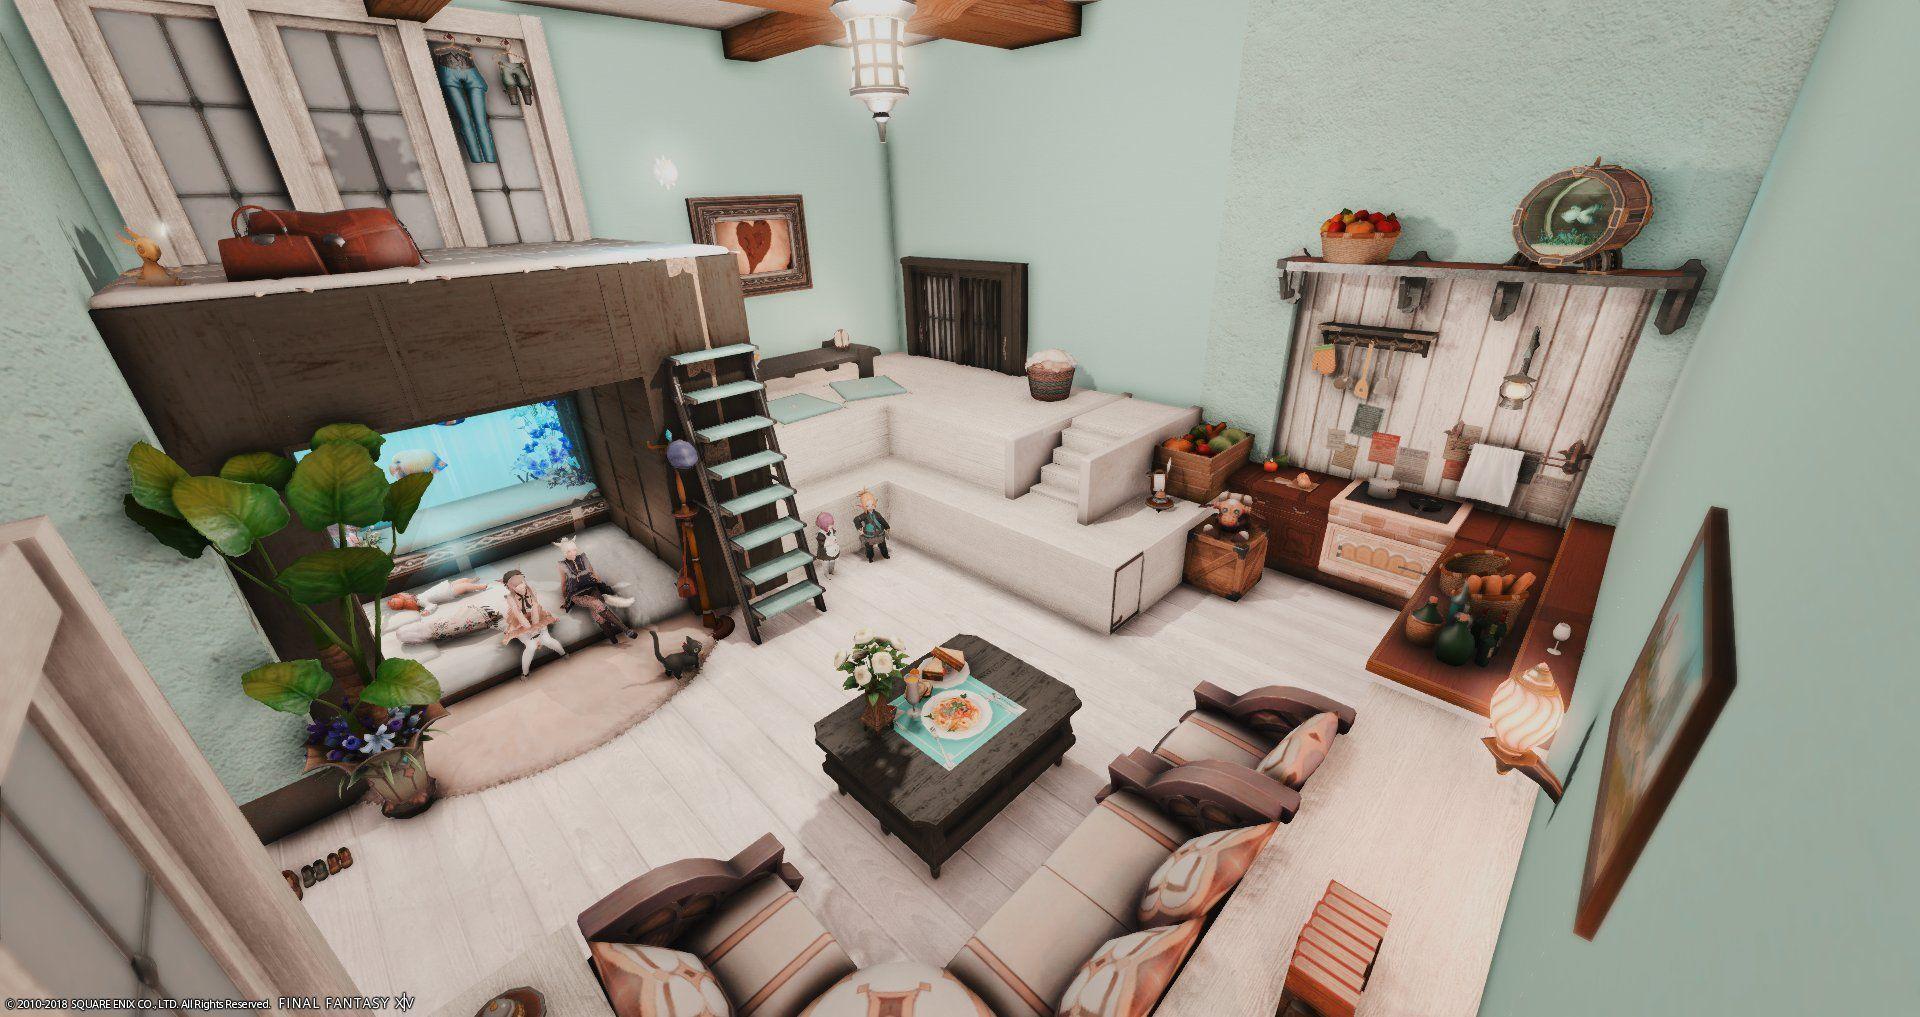 52 Ffxiv Housing Inspiration Ideas In 2021 Inspiration Final Fantasy Xiv Ff14